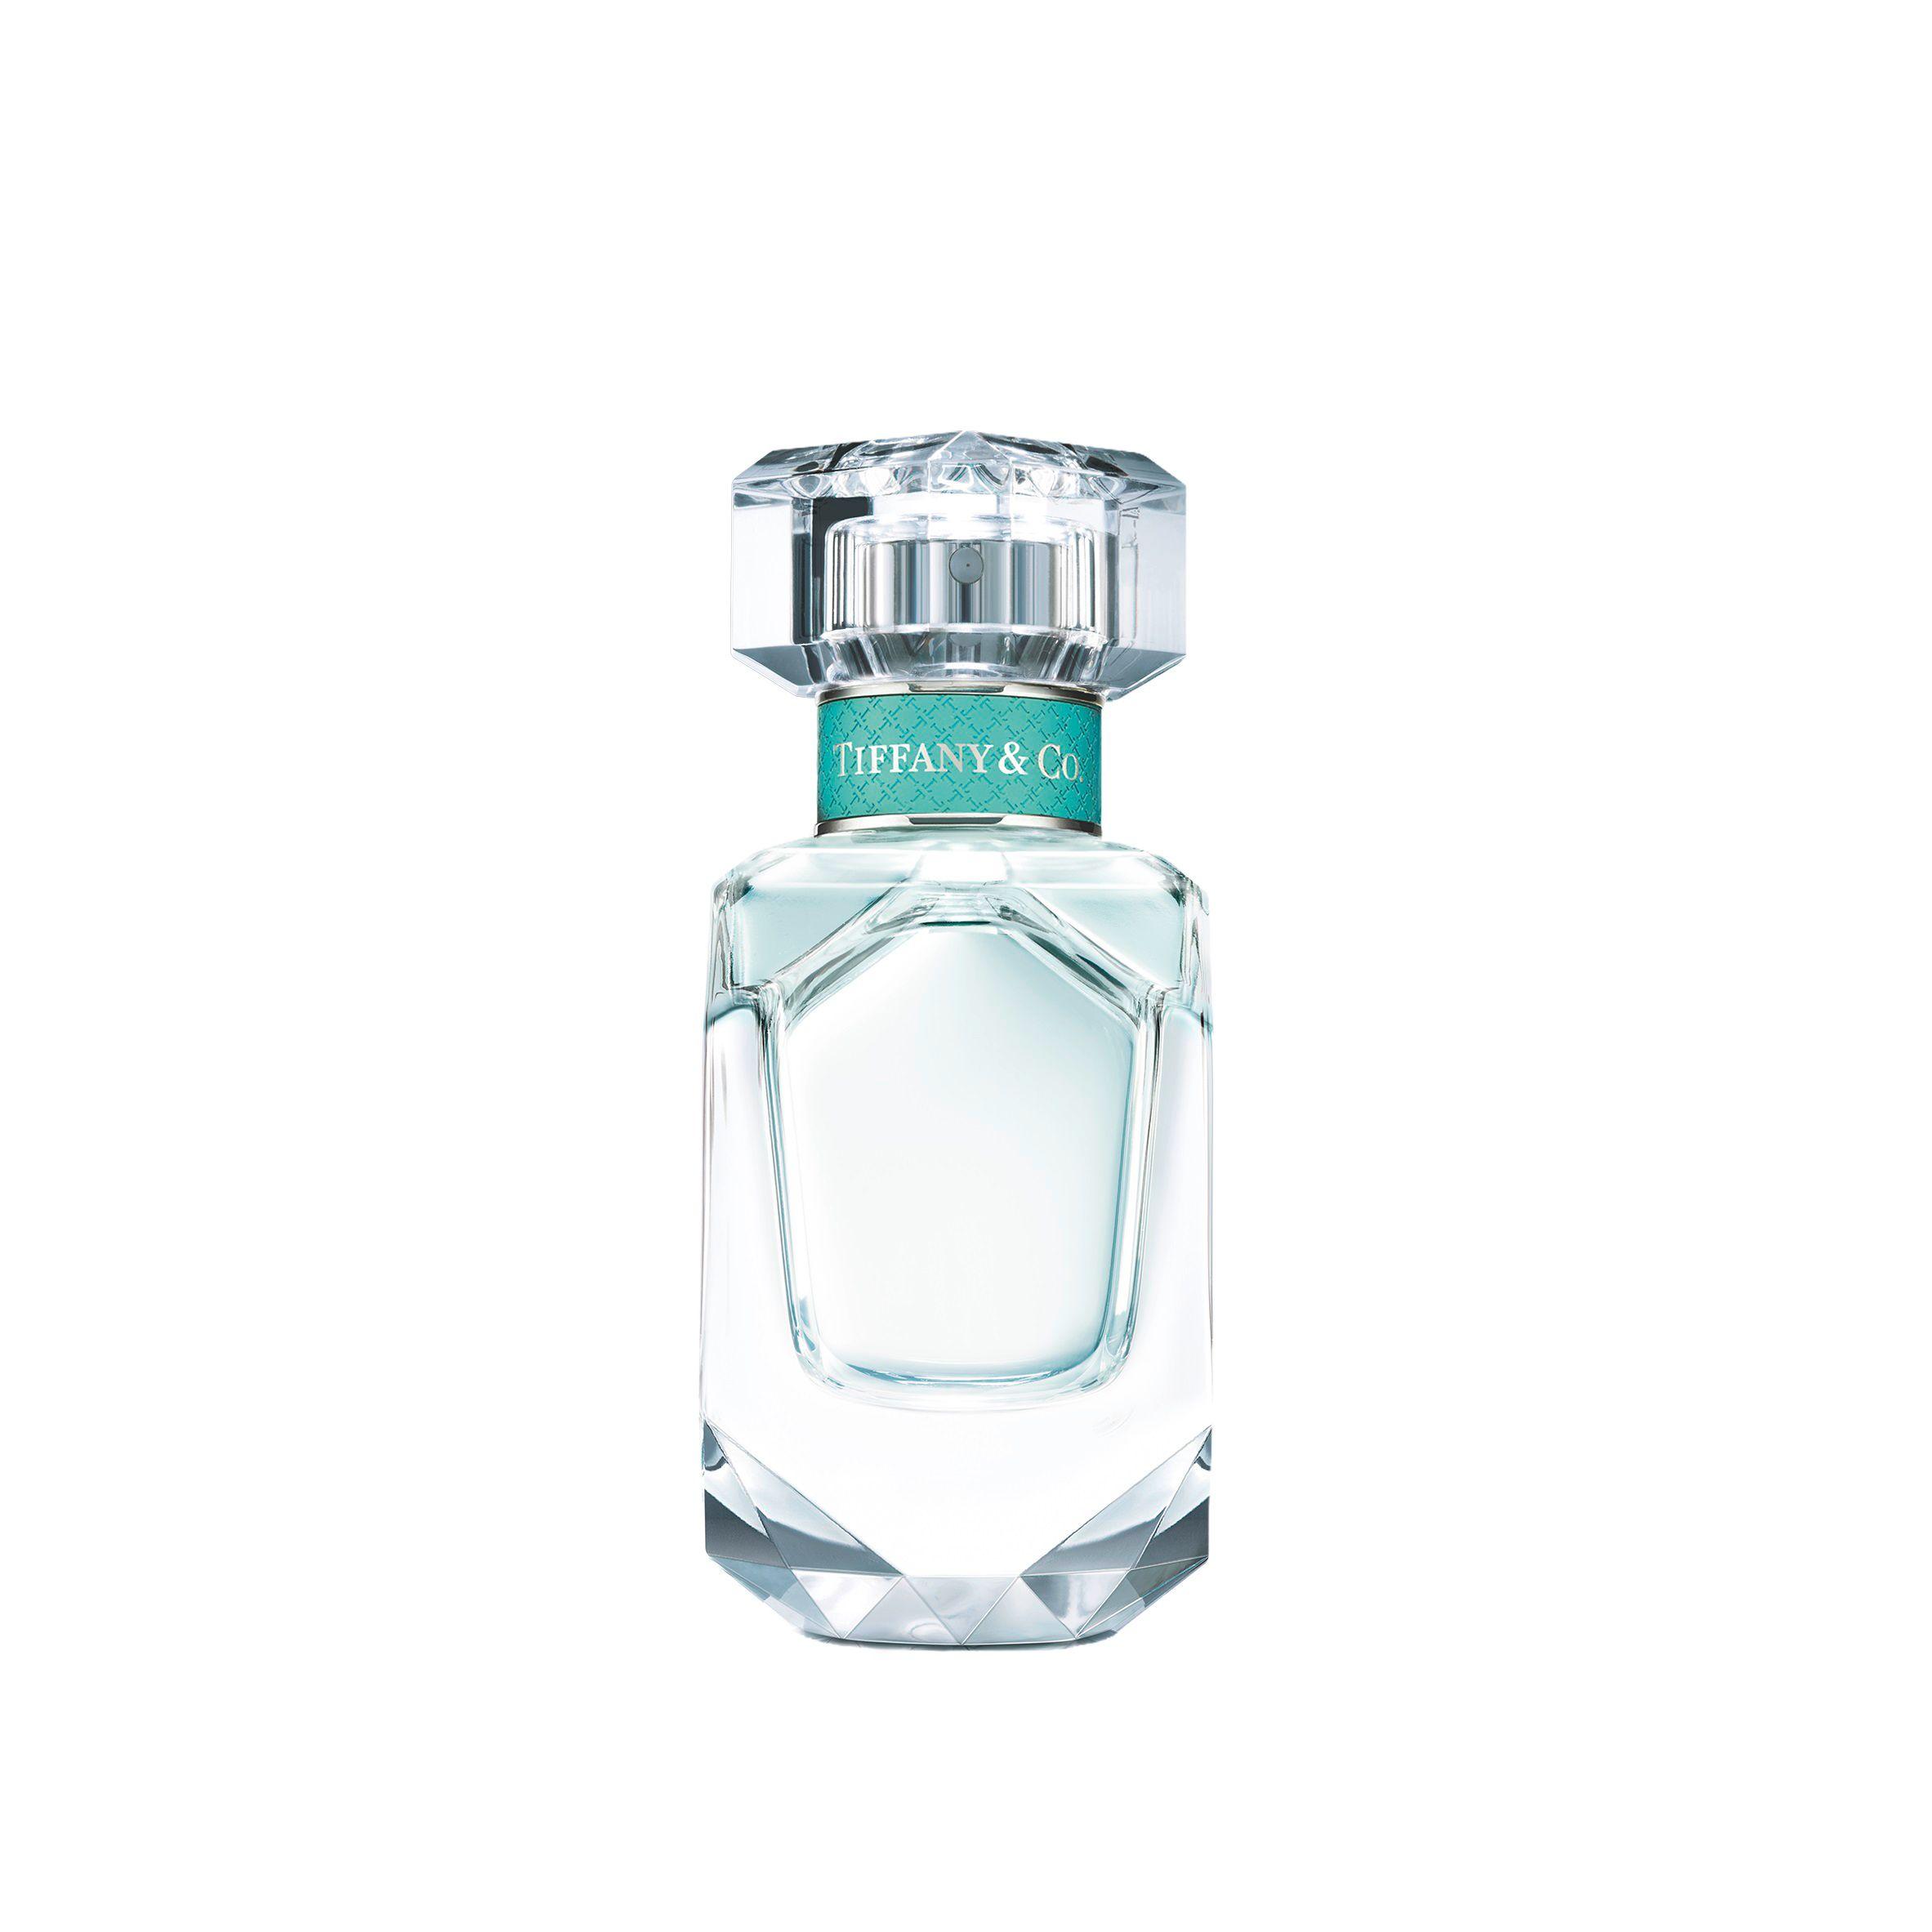 Tiffany & Co. - Eau De Parfum 30 ml